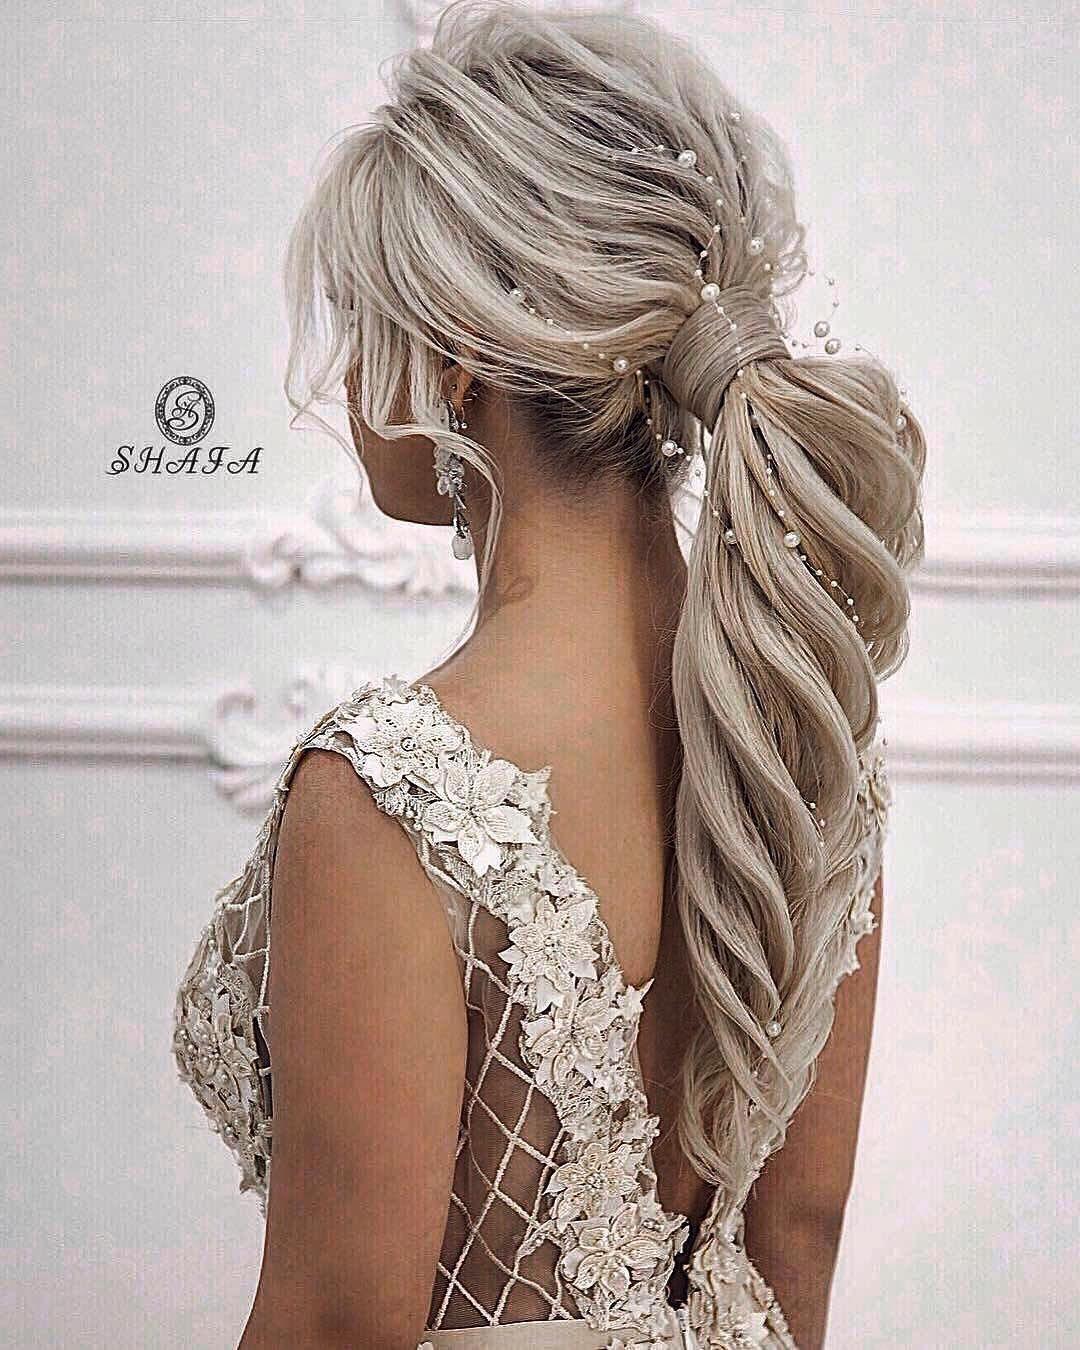 Sac Pricheska Hairstyle Shafaqnovruz Aksesuar Aksessua Long Hair Styles Hair Styles Long Thin Hair